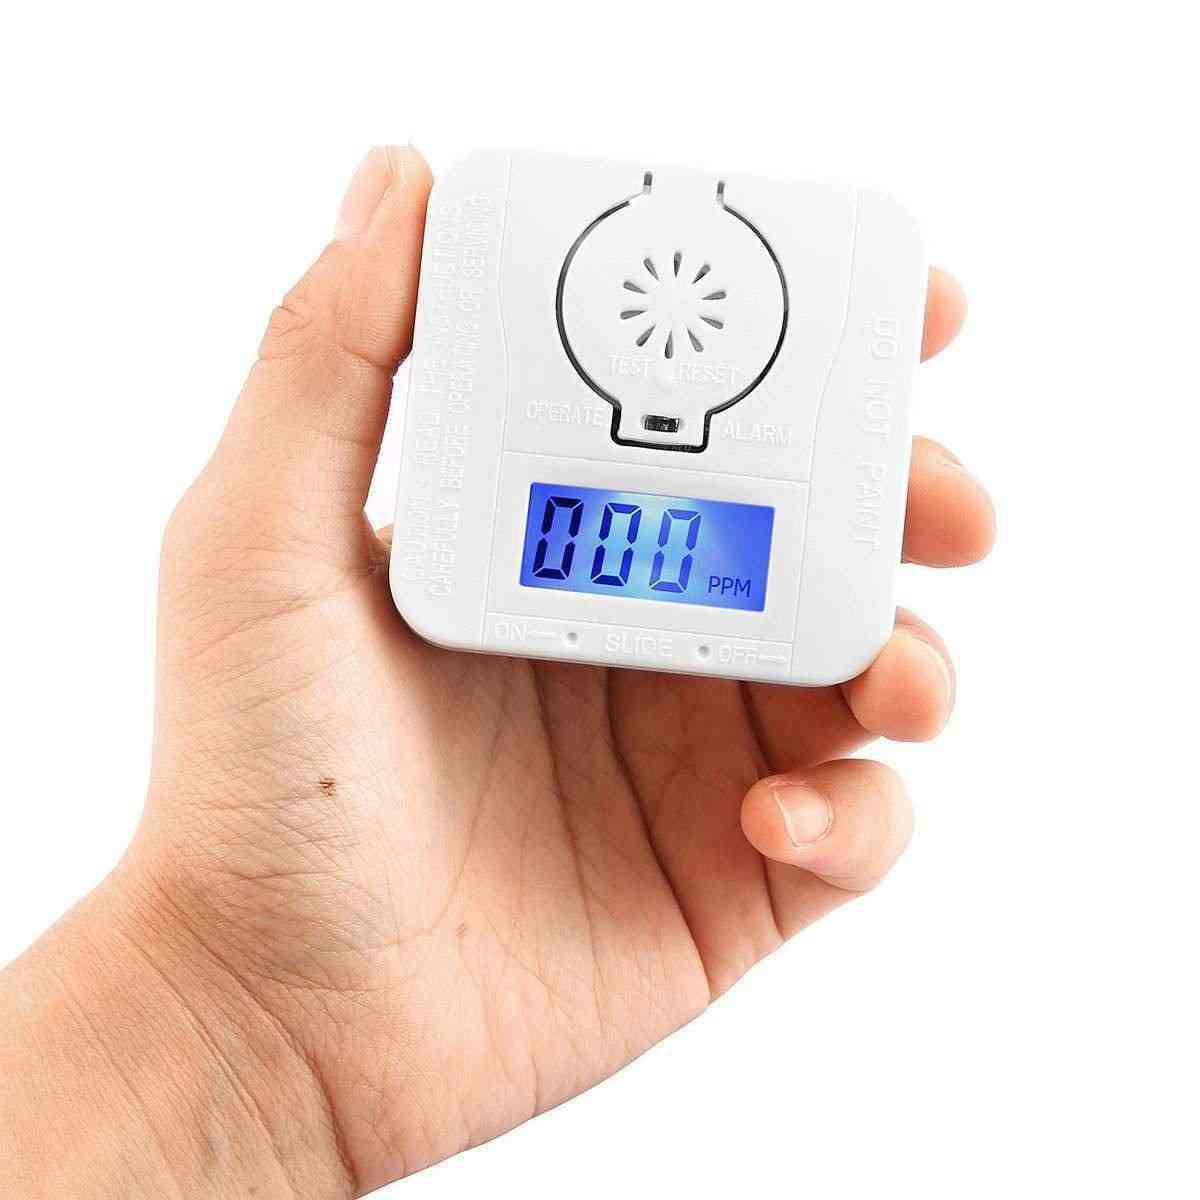 New-co Carbon Monoxide Smoke Detector Alarm